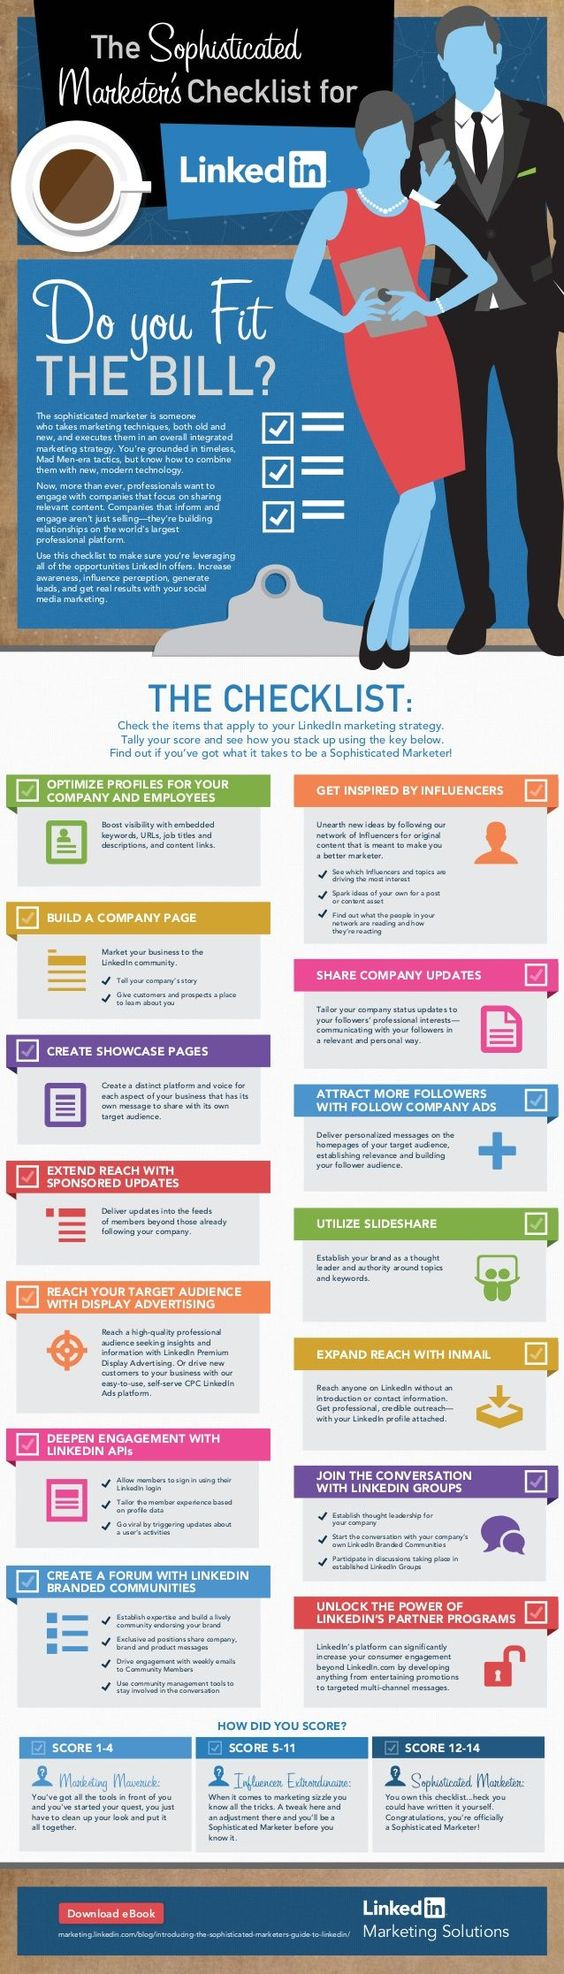 Checklist para marketeros sofisticados en Linkedin #infografia #infographic #socialmedia #marketing